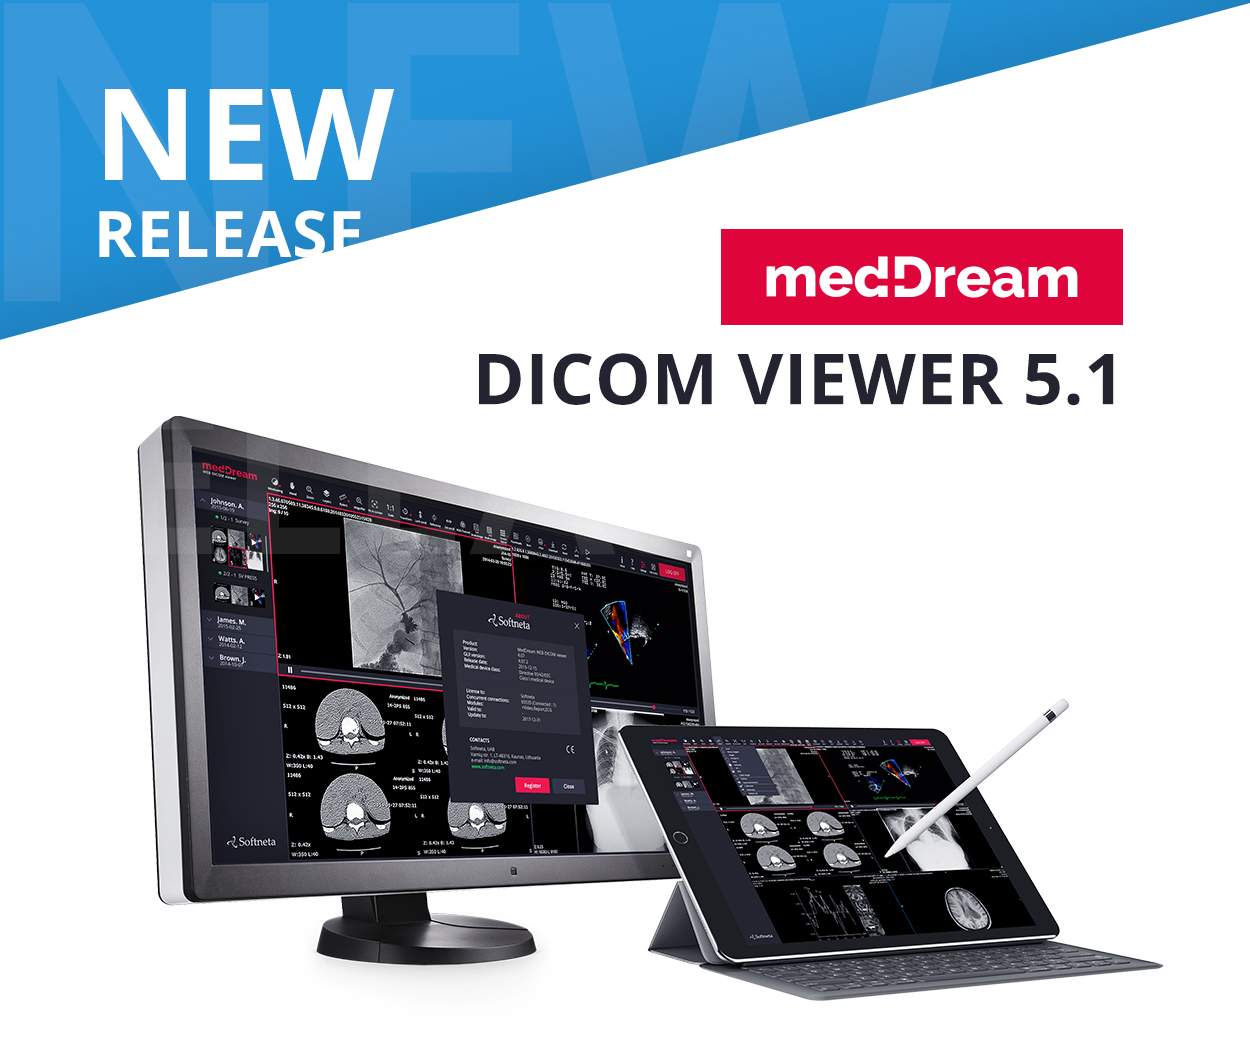 web based MedDream DICOM Viewer New Realease